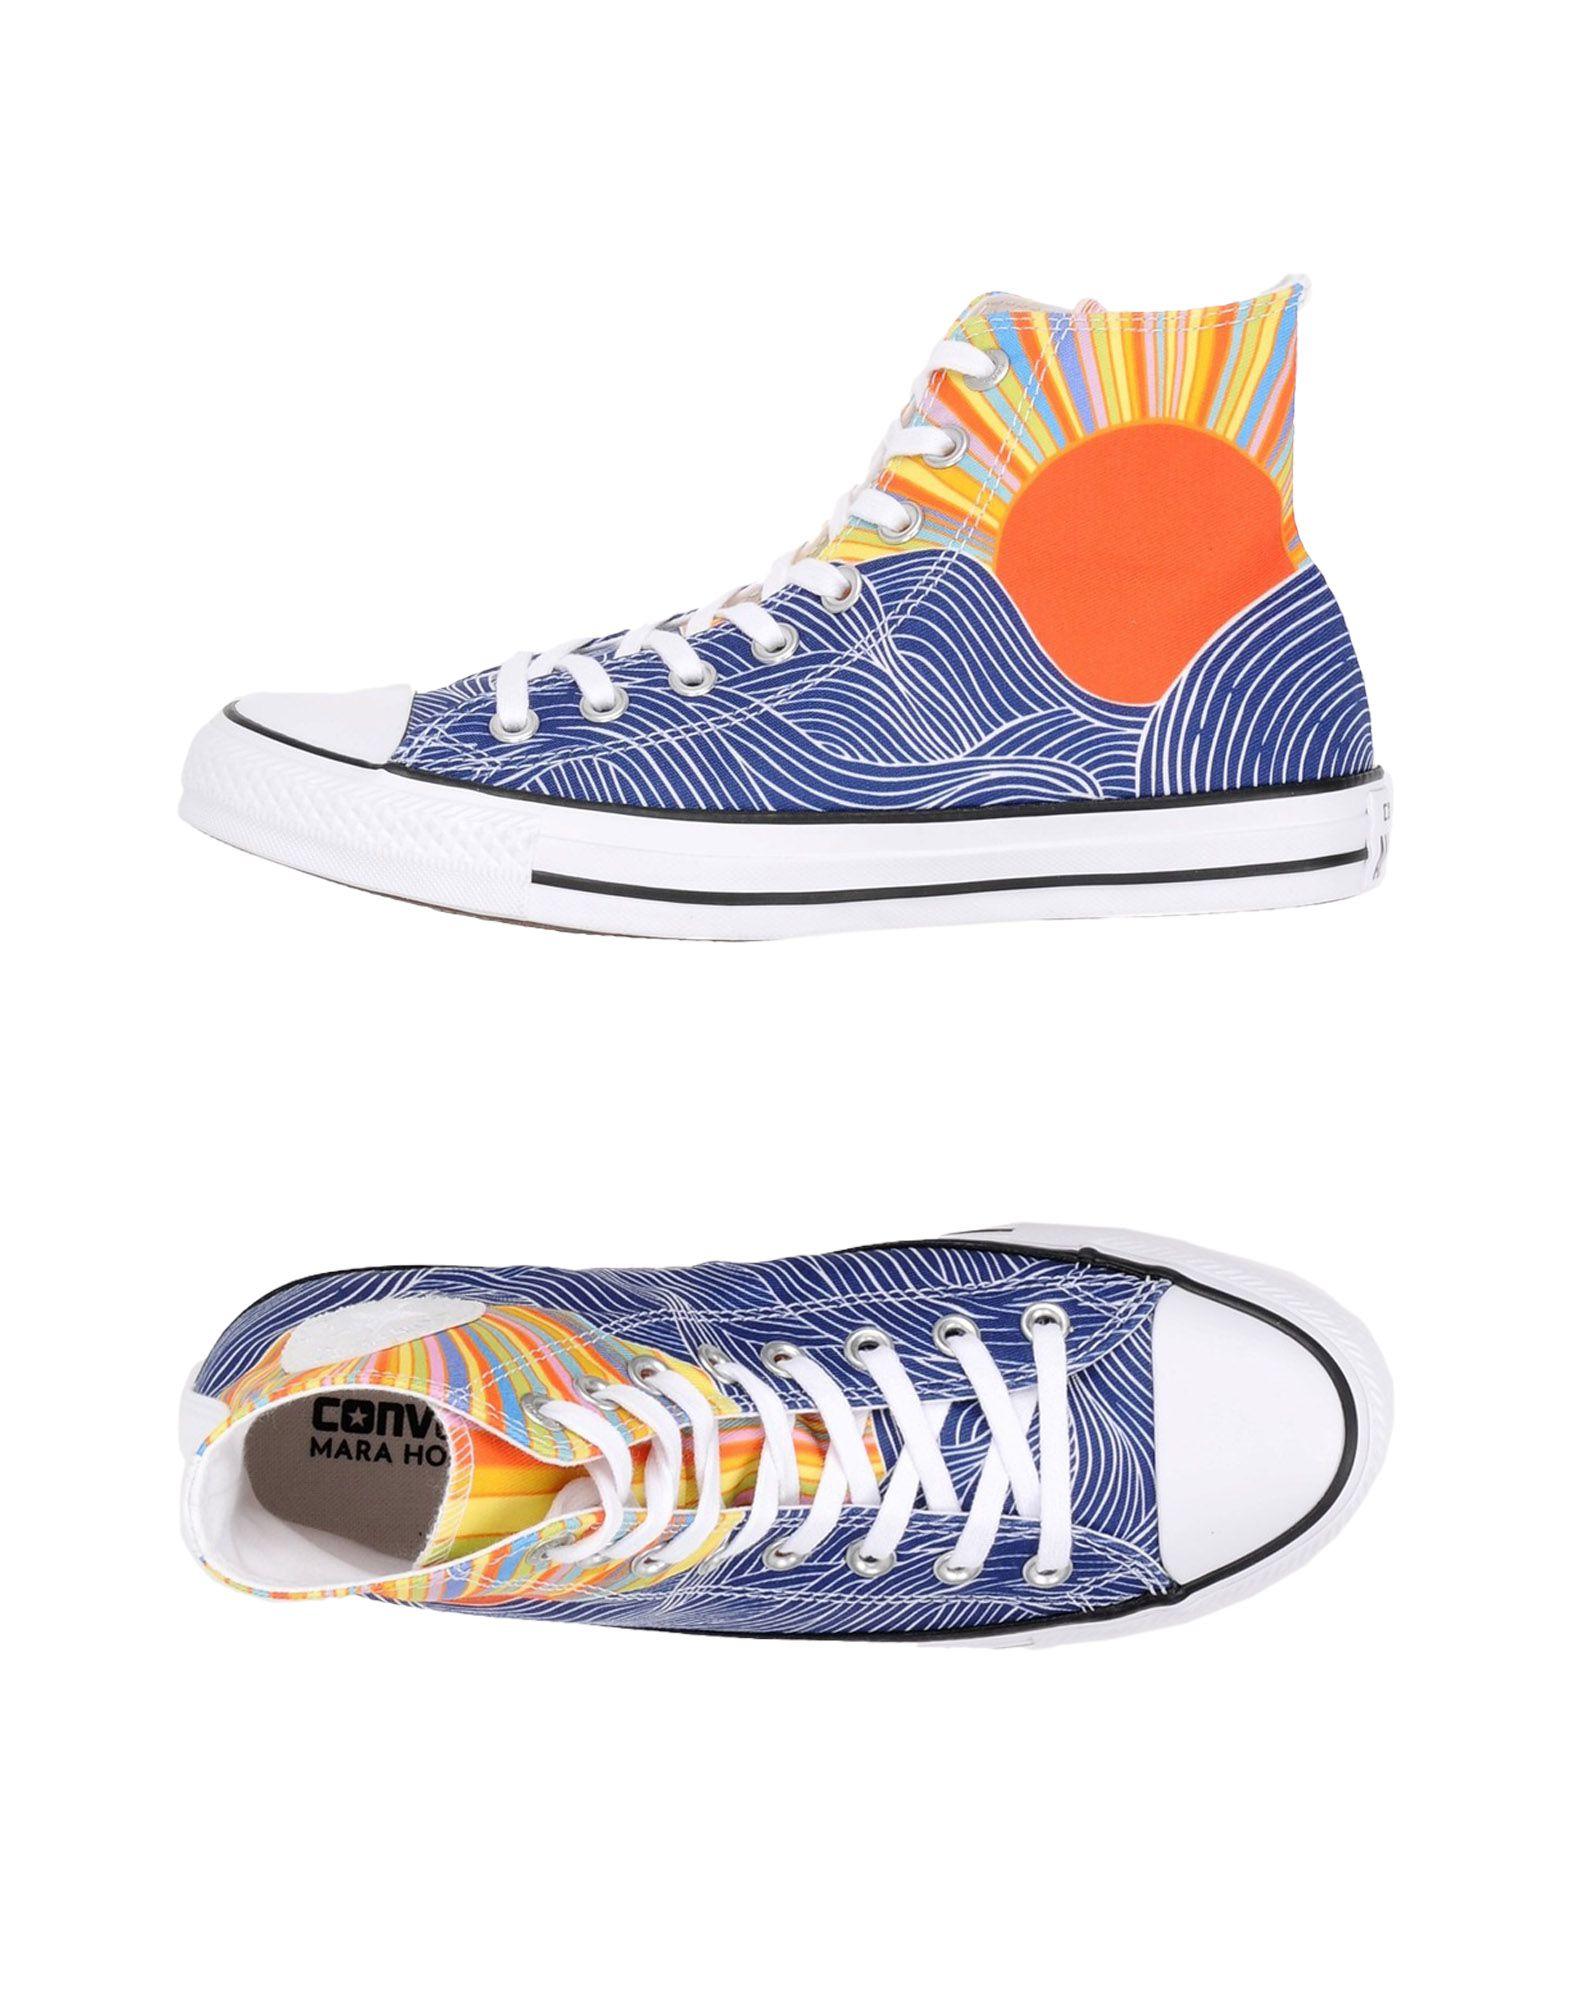 Converse All Star Ct As Hi Canvas Misun Mara Hoffman  11336490FM Gute Qualität beliebte Schuhe